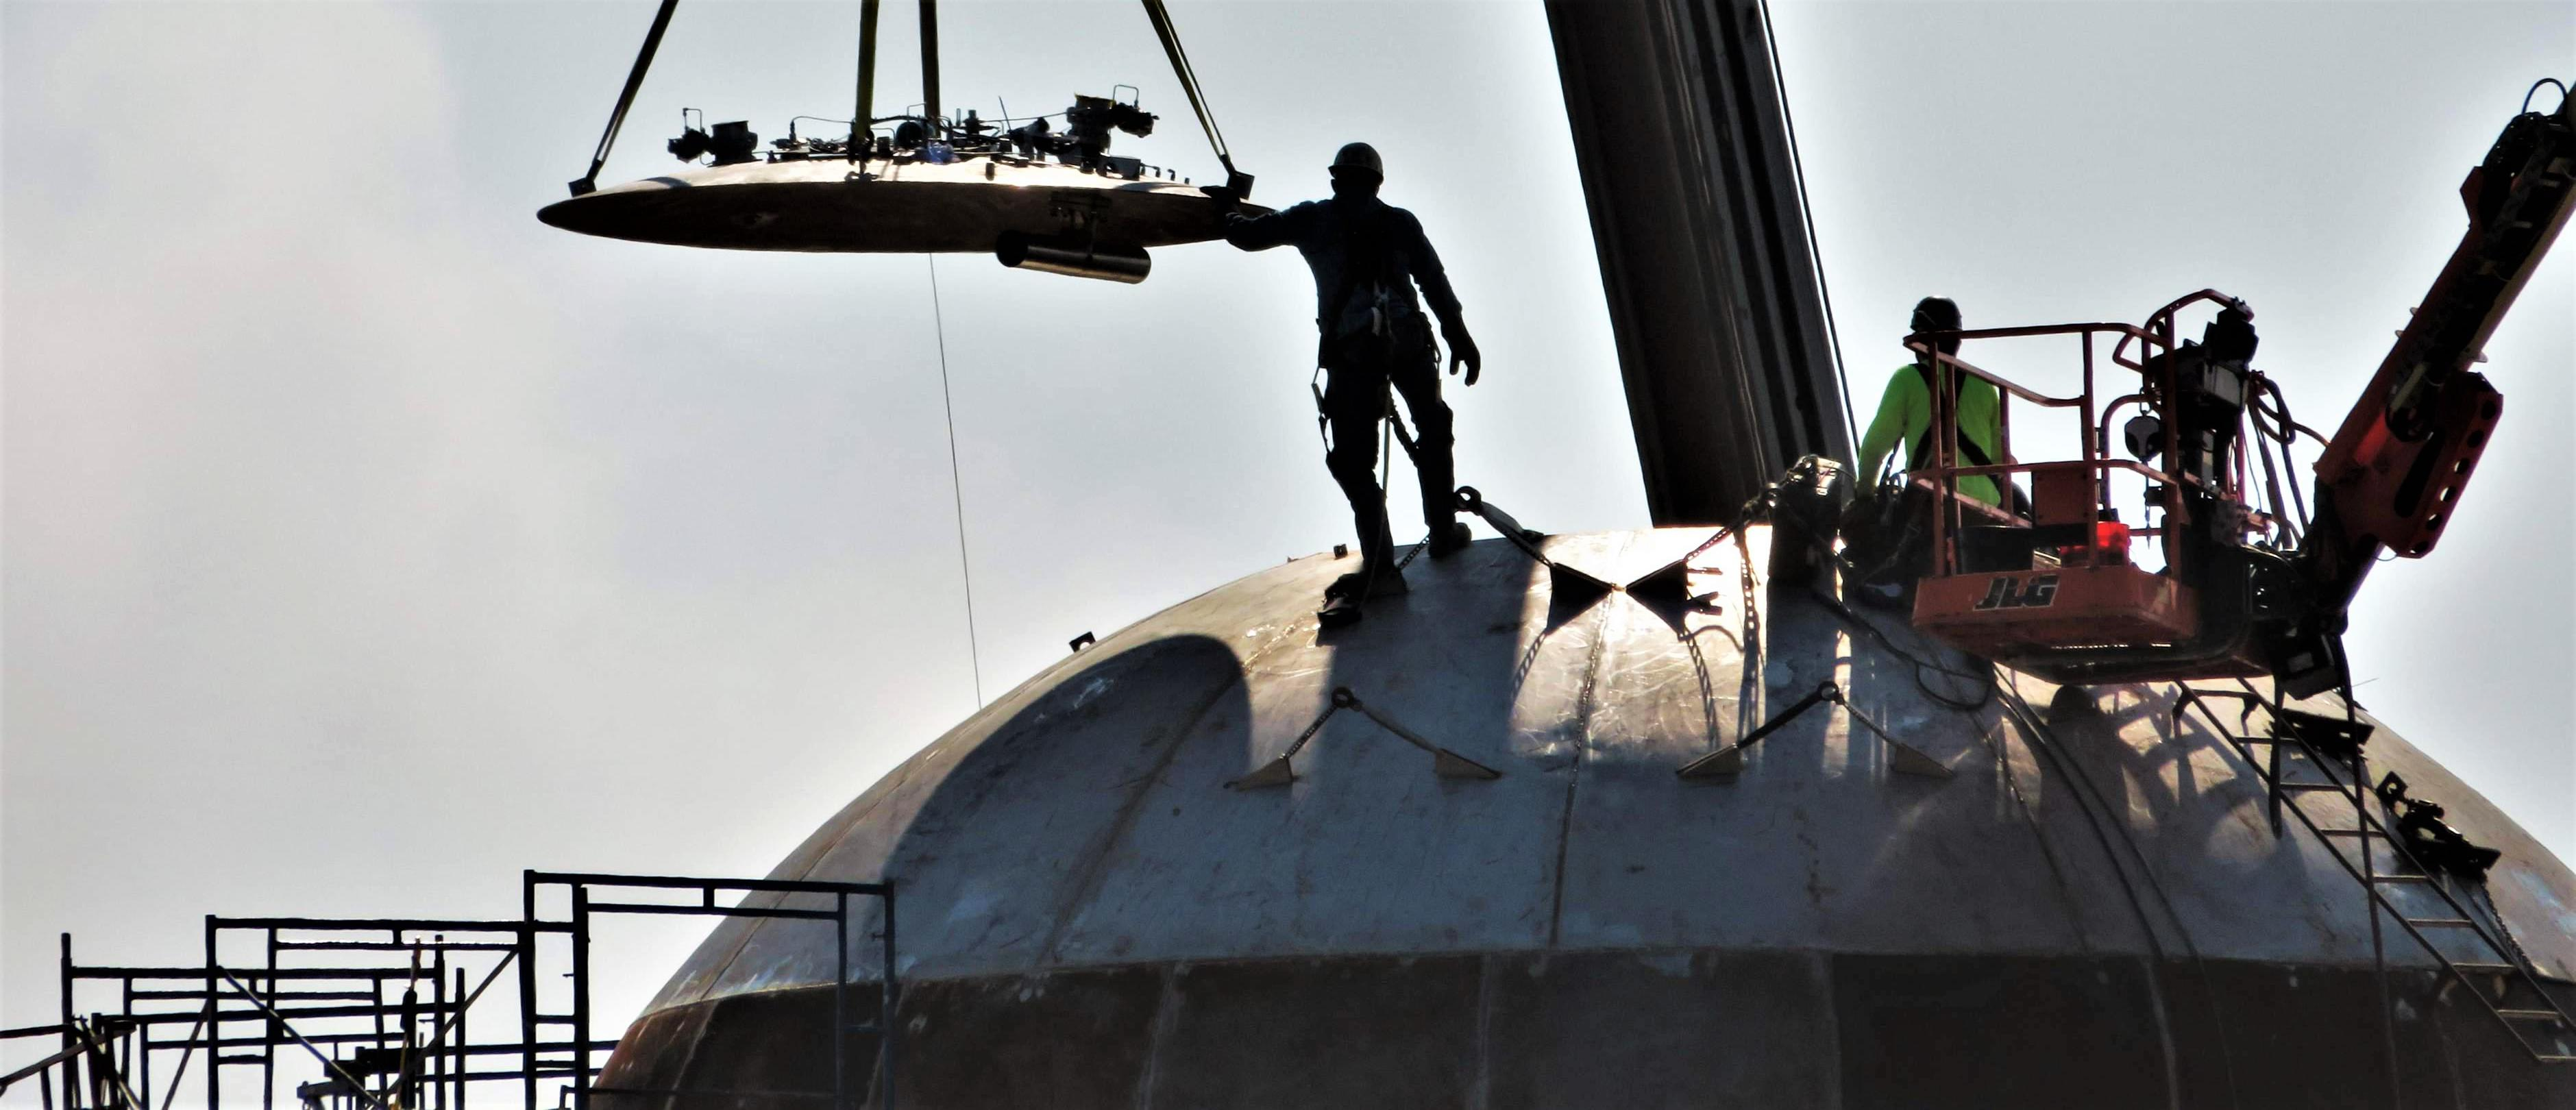 Boca Chica Starship dome cap install 020519 (NASASpaceflight – bocachicagal) 1 edit (c) – Copy